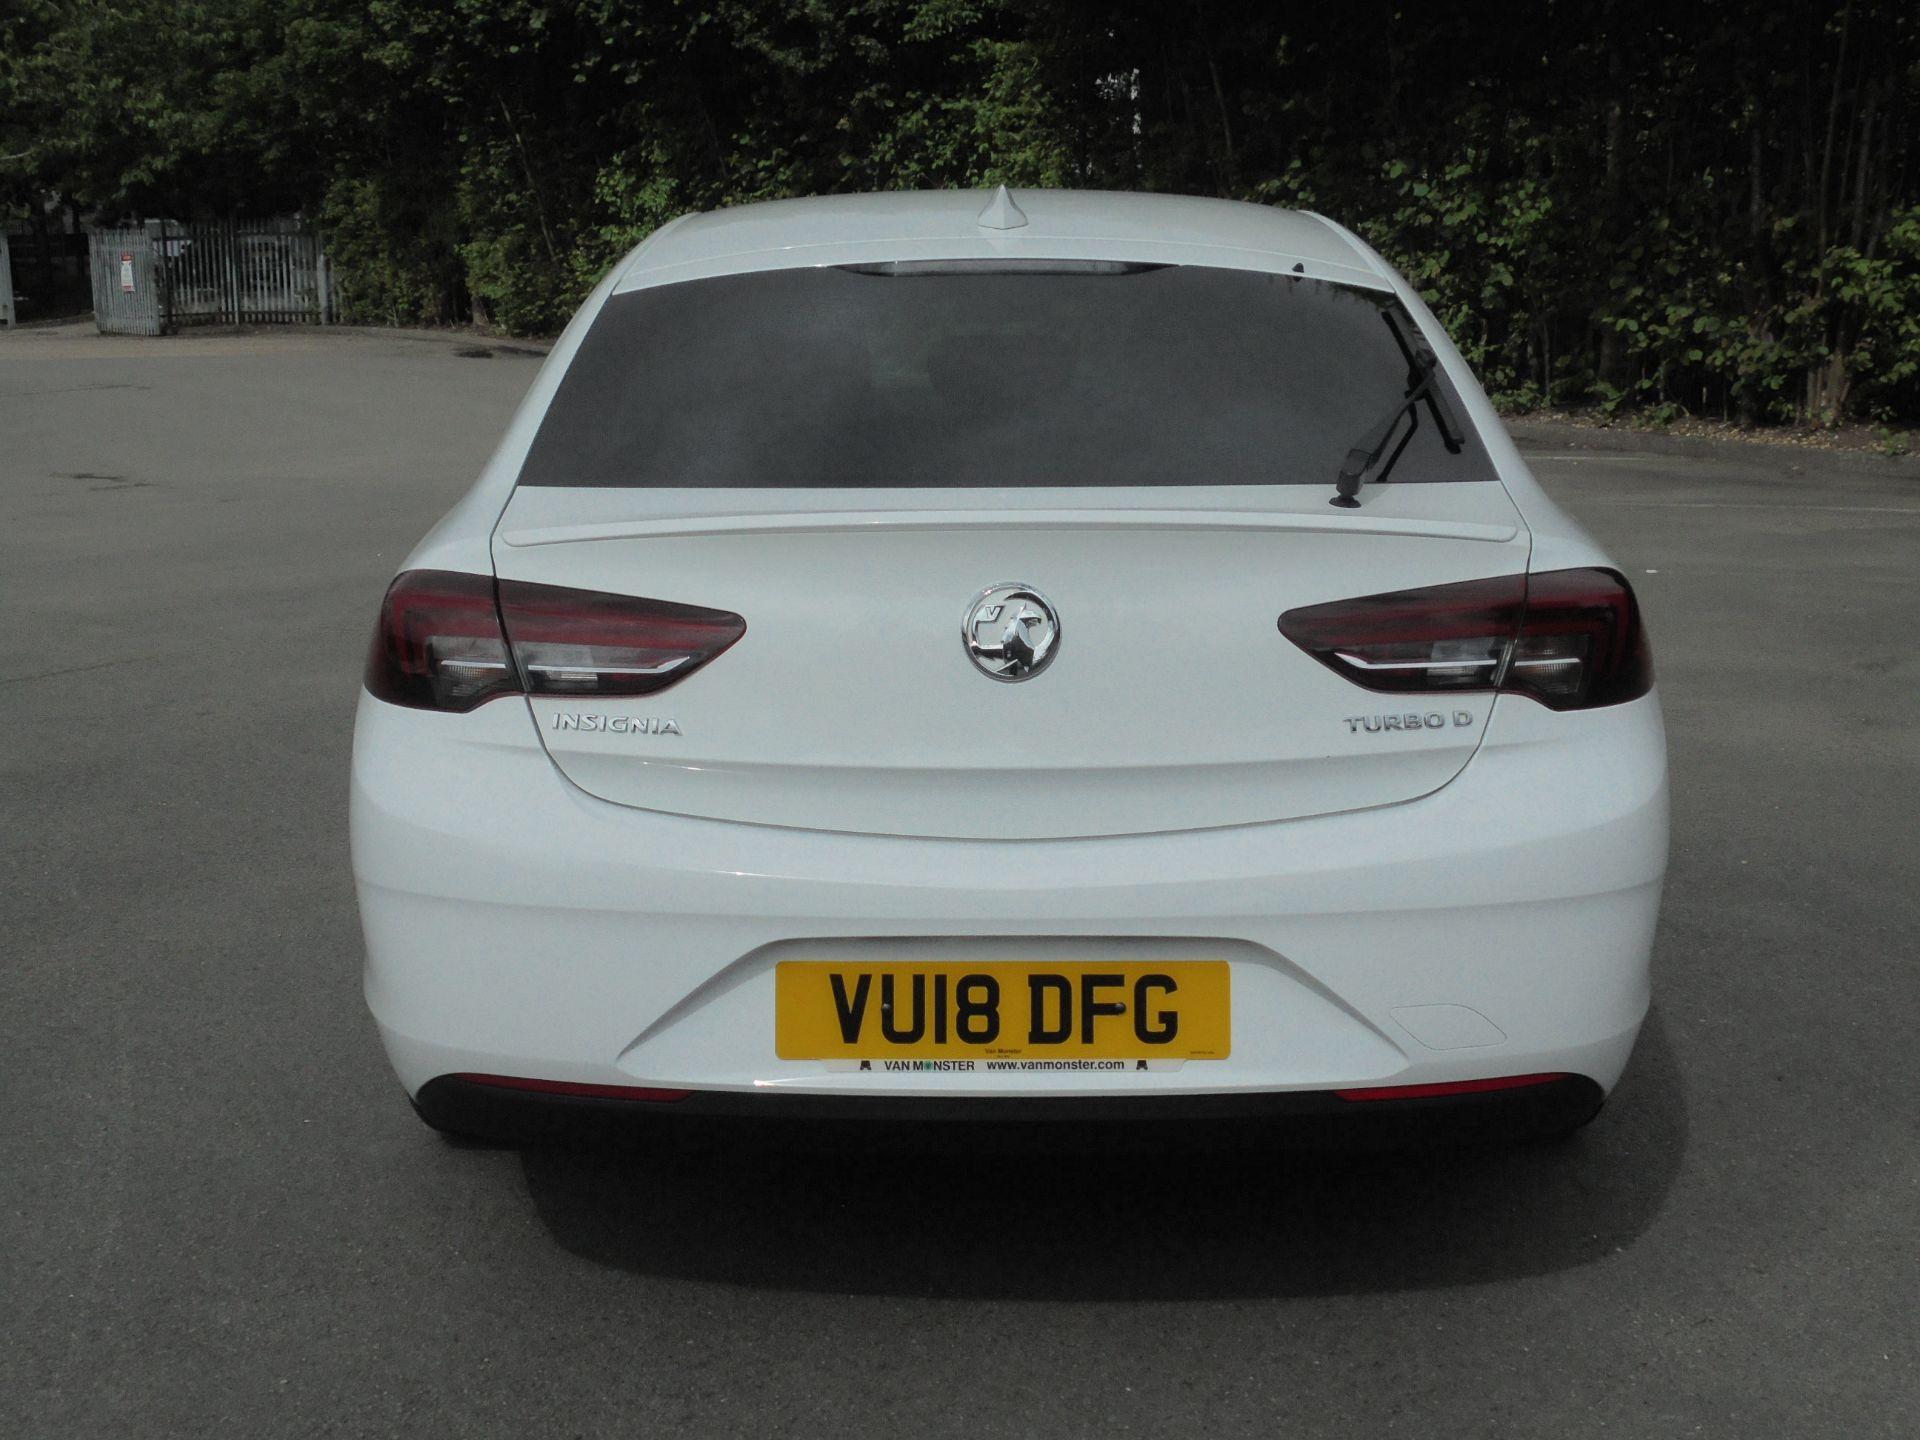 2018 Vauxhall Insignia 1.6 Grand Sport Turbo D Ecotec [136] Sri Nav 5Dr (VU18DFG) Image 8